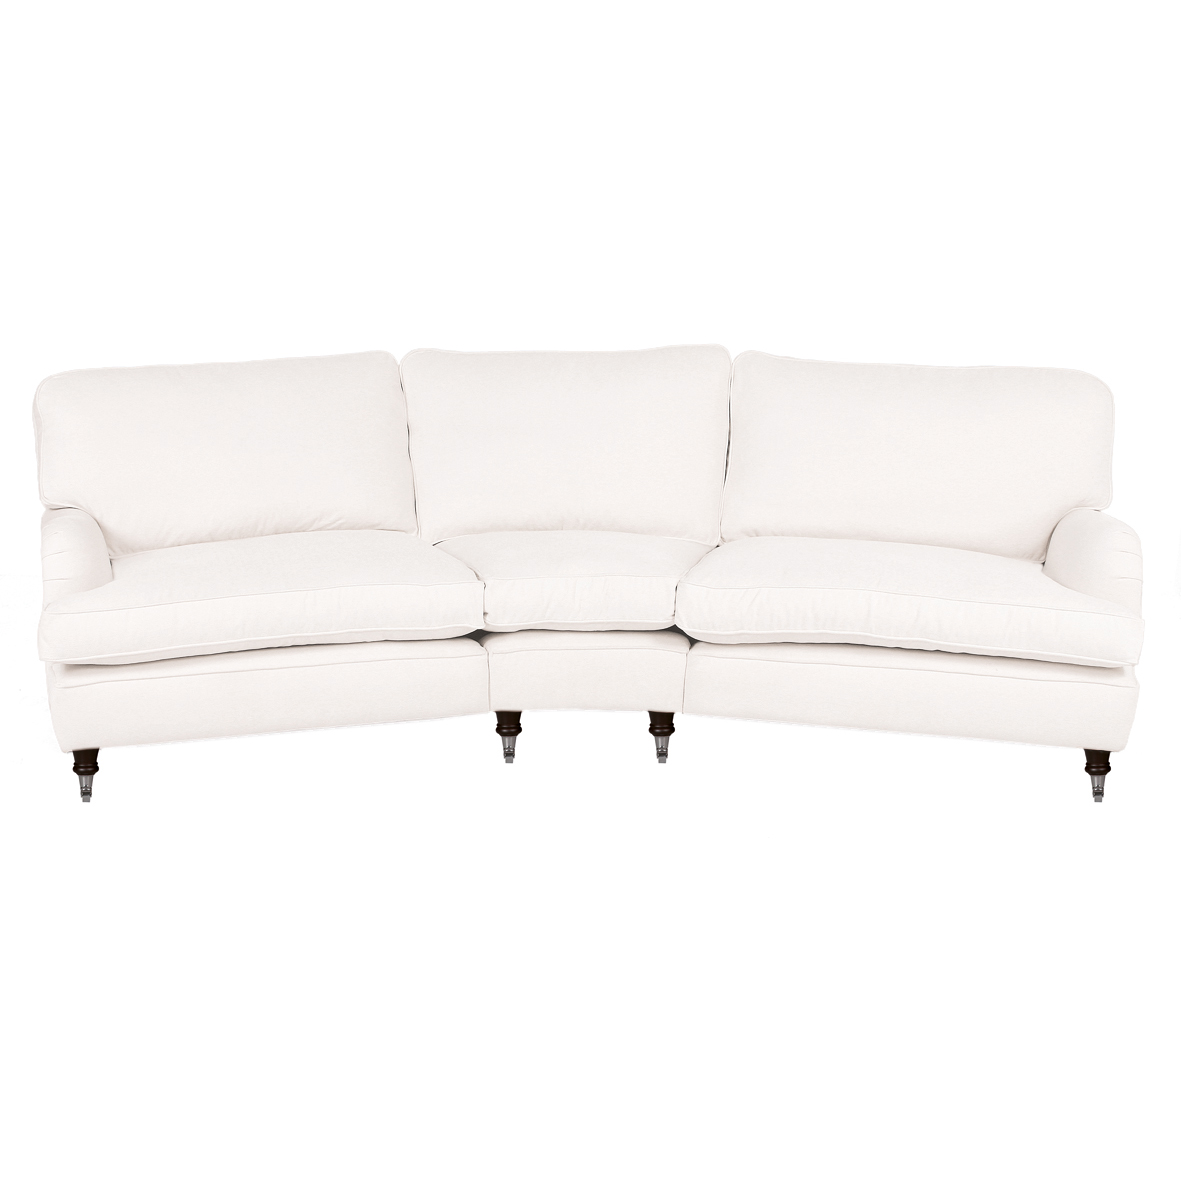 Howard soffa 4-sits svängd - englesson.se